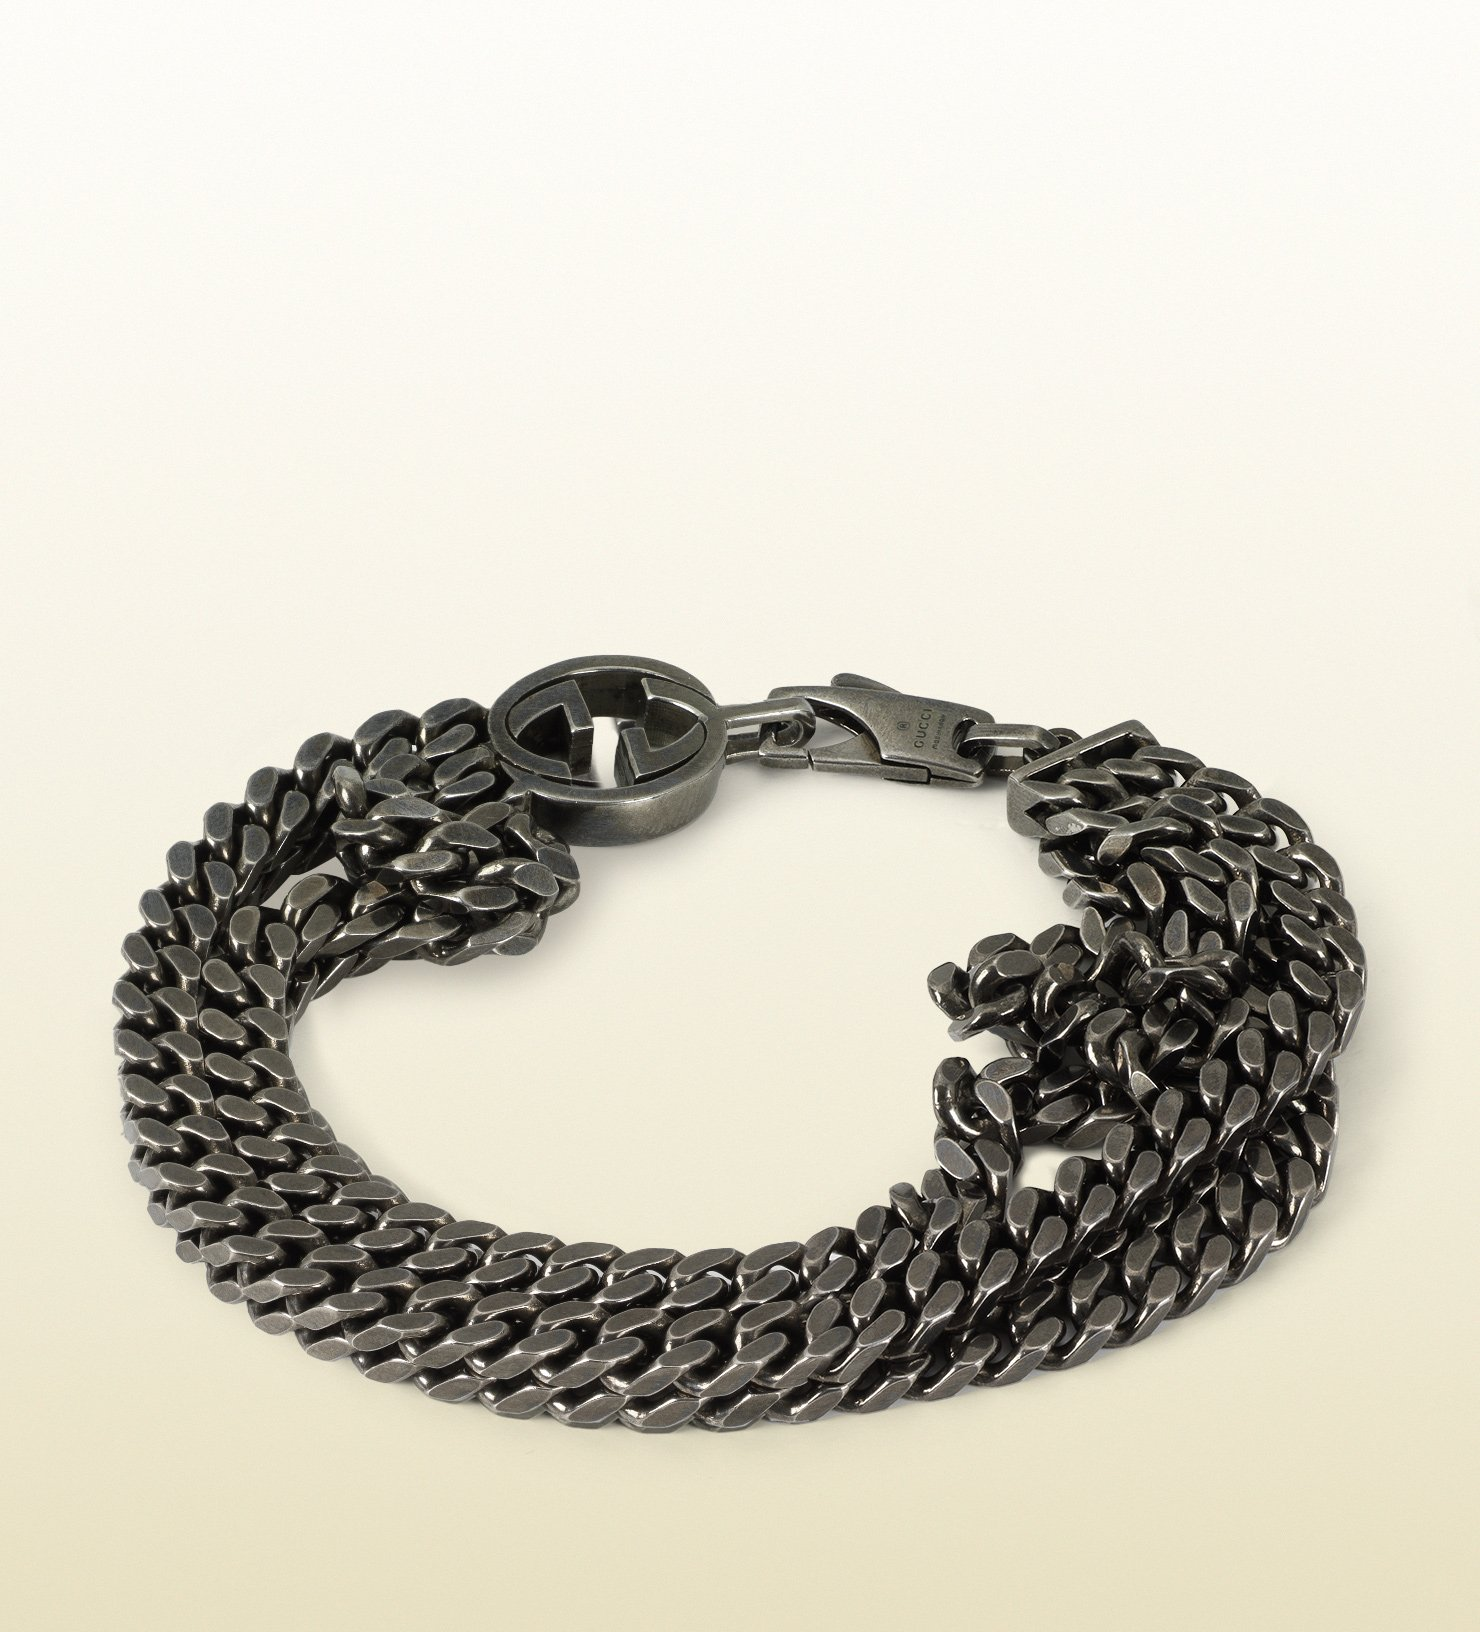 61375c46ad14 Lyst - Gucci Online Exclusive Silver Bracelet With Interlocking G ...